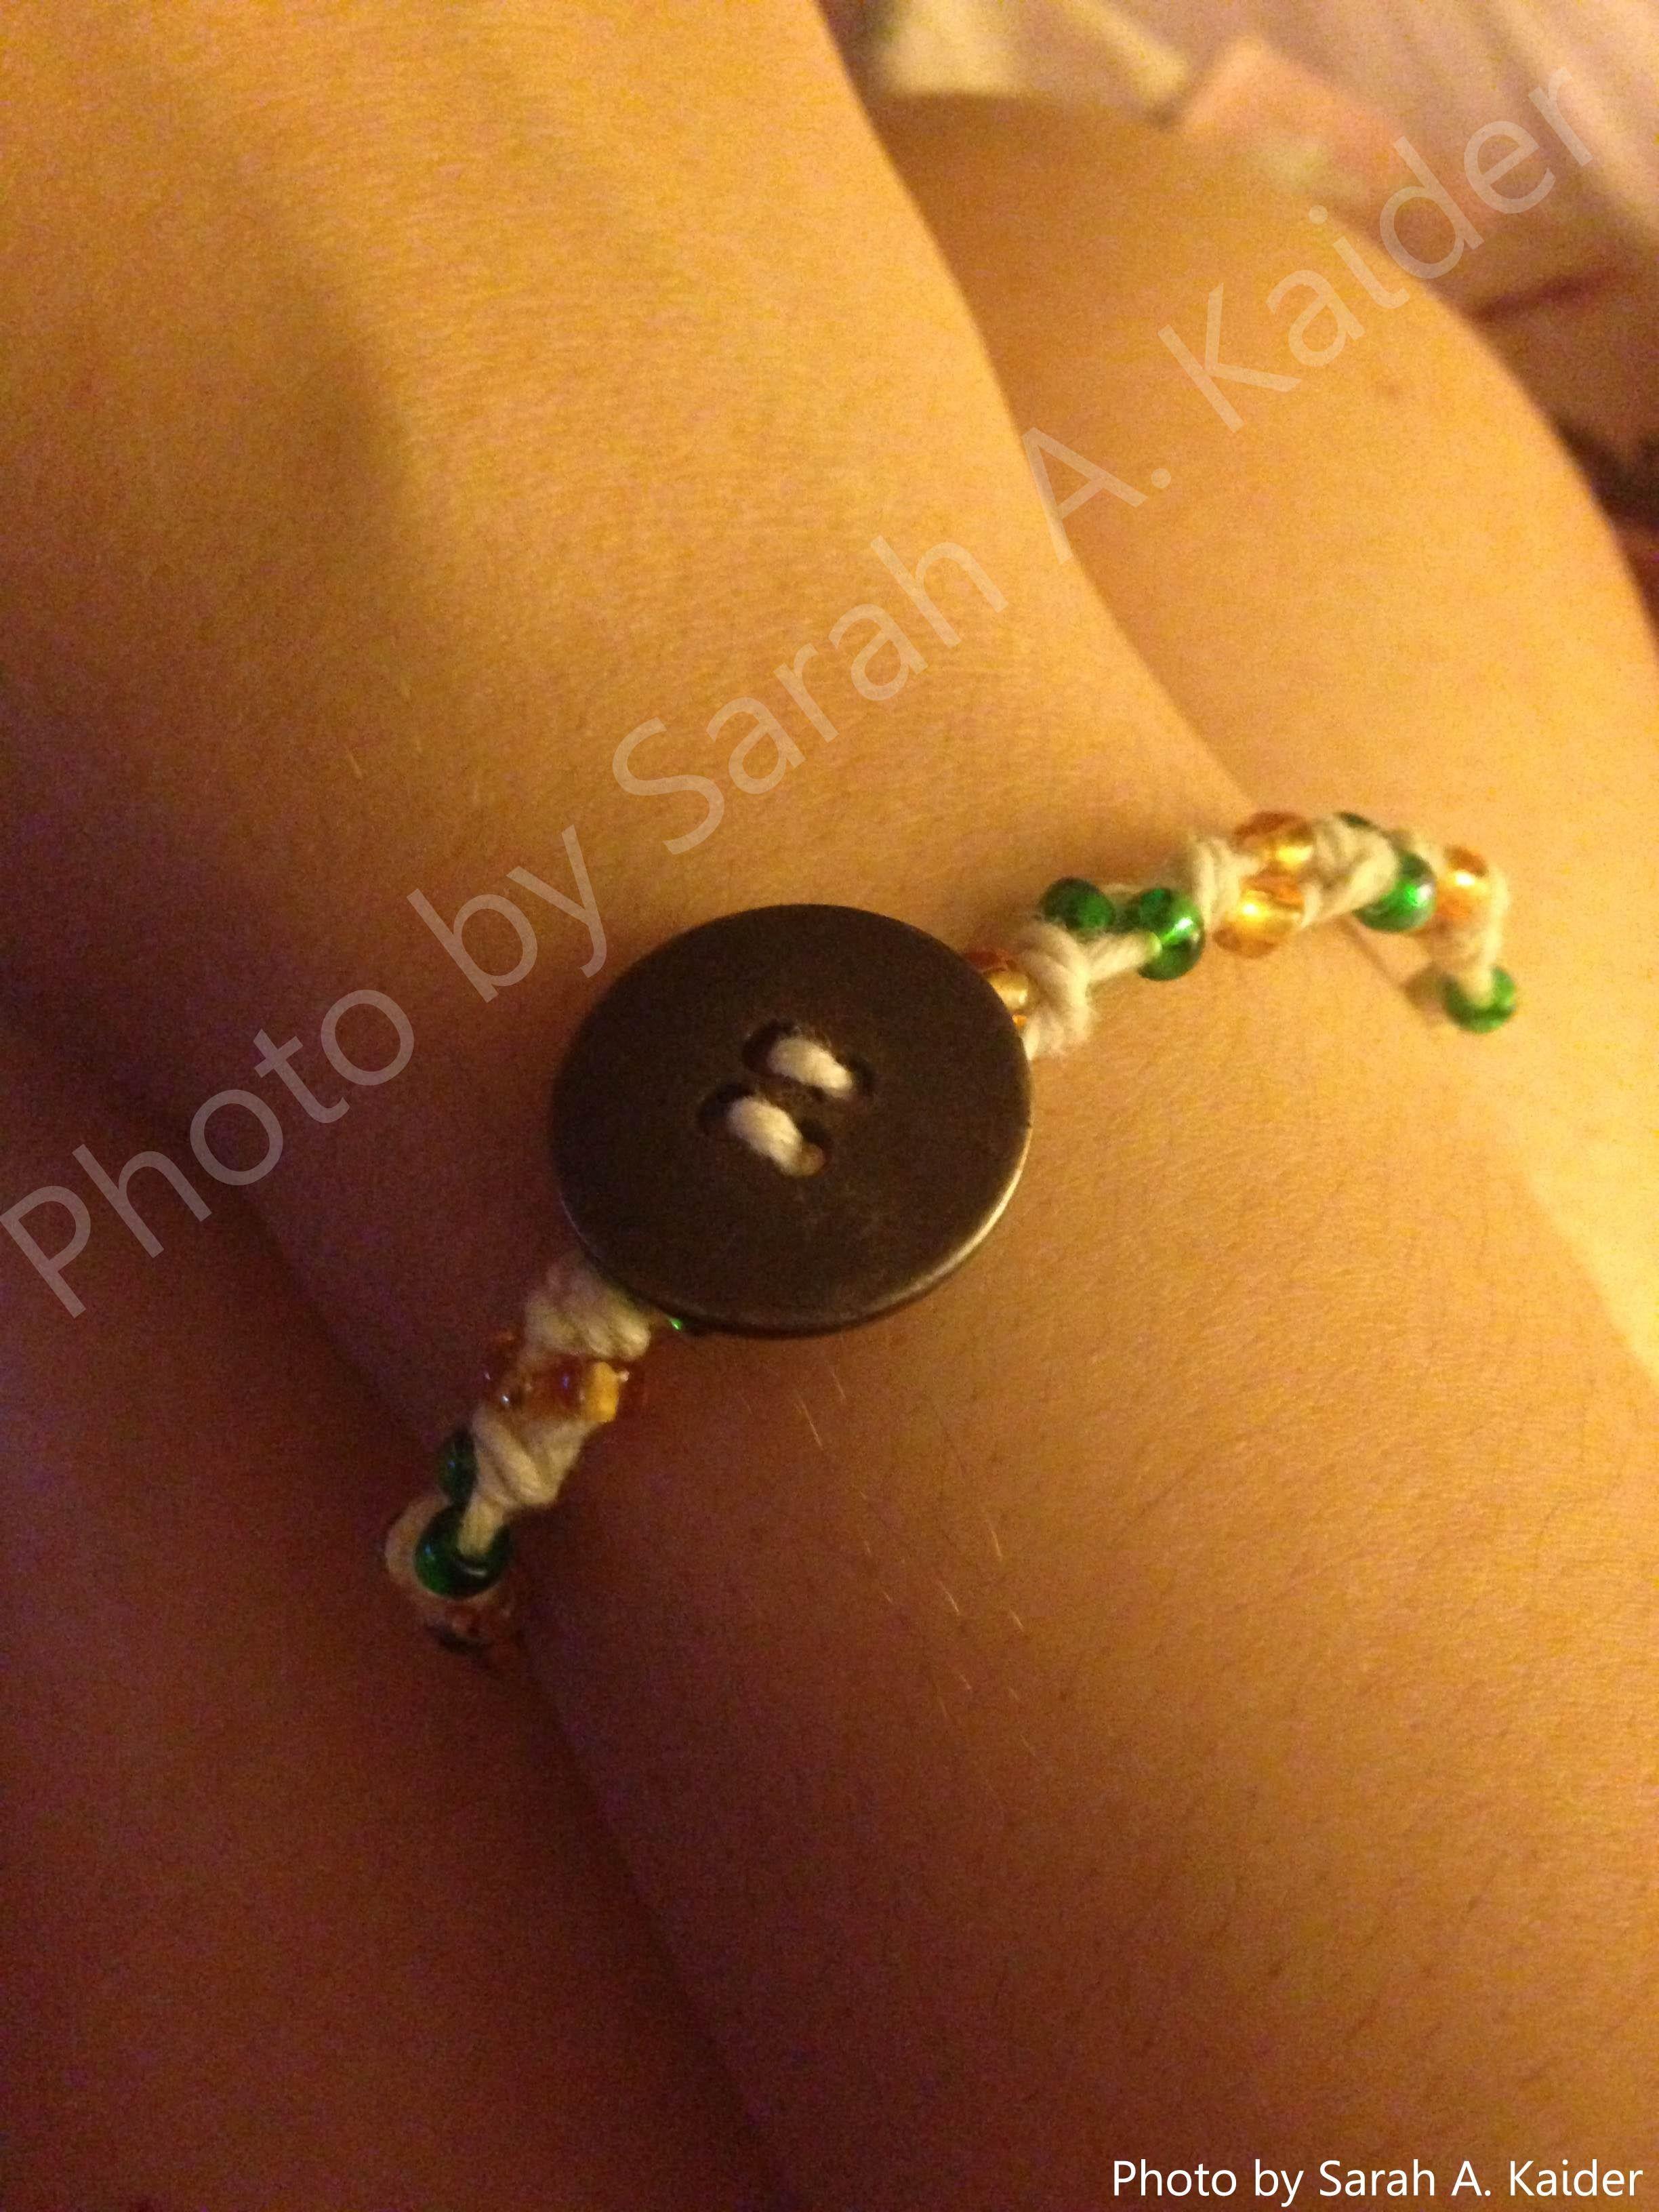 I made this bracelet today, 4/11/13.